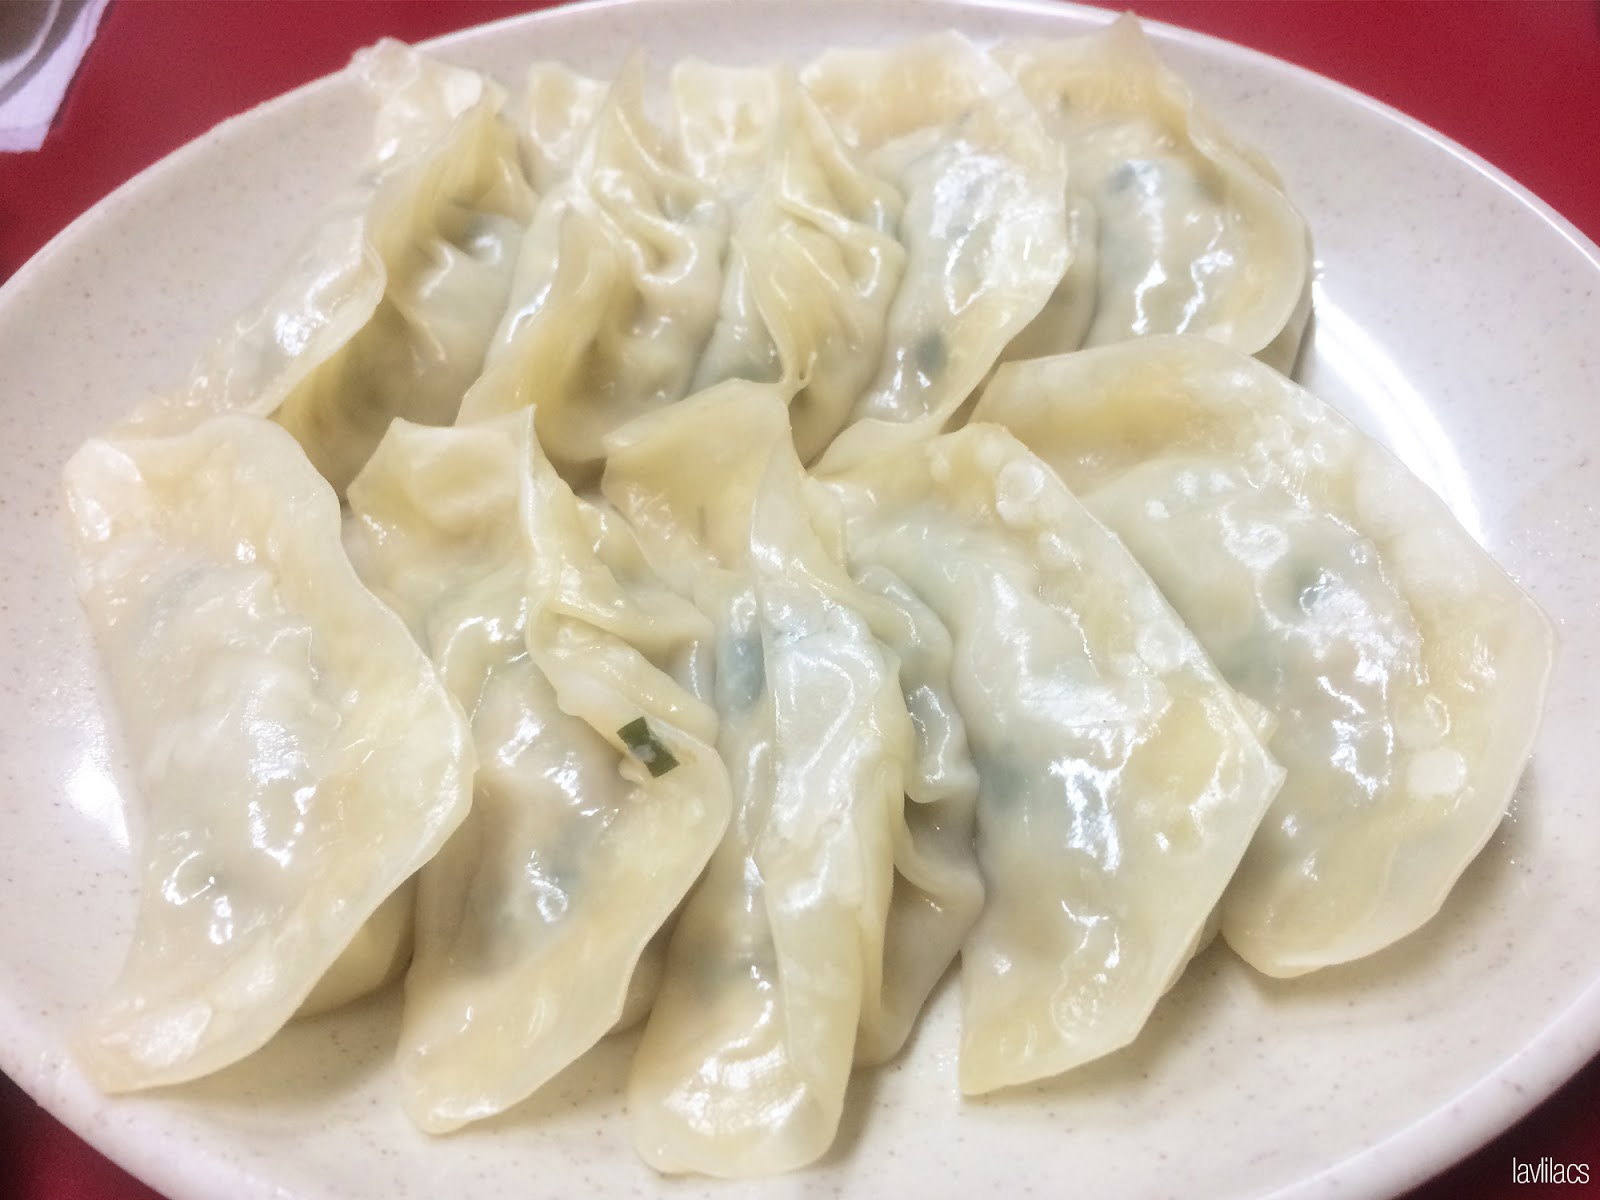 Seoul, Korea - Summer Study Abroad 2014 - Yeonhuidong 연희동- Five Spice Mandoo 五香만두 Steamed dumplings jjinmandoo 찐만두